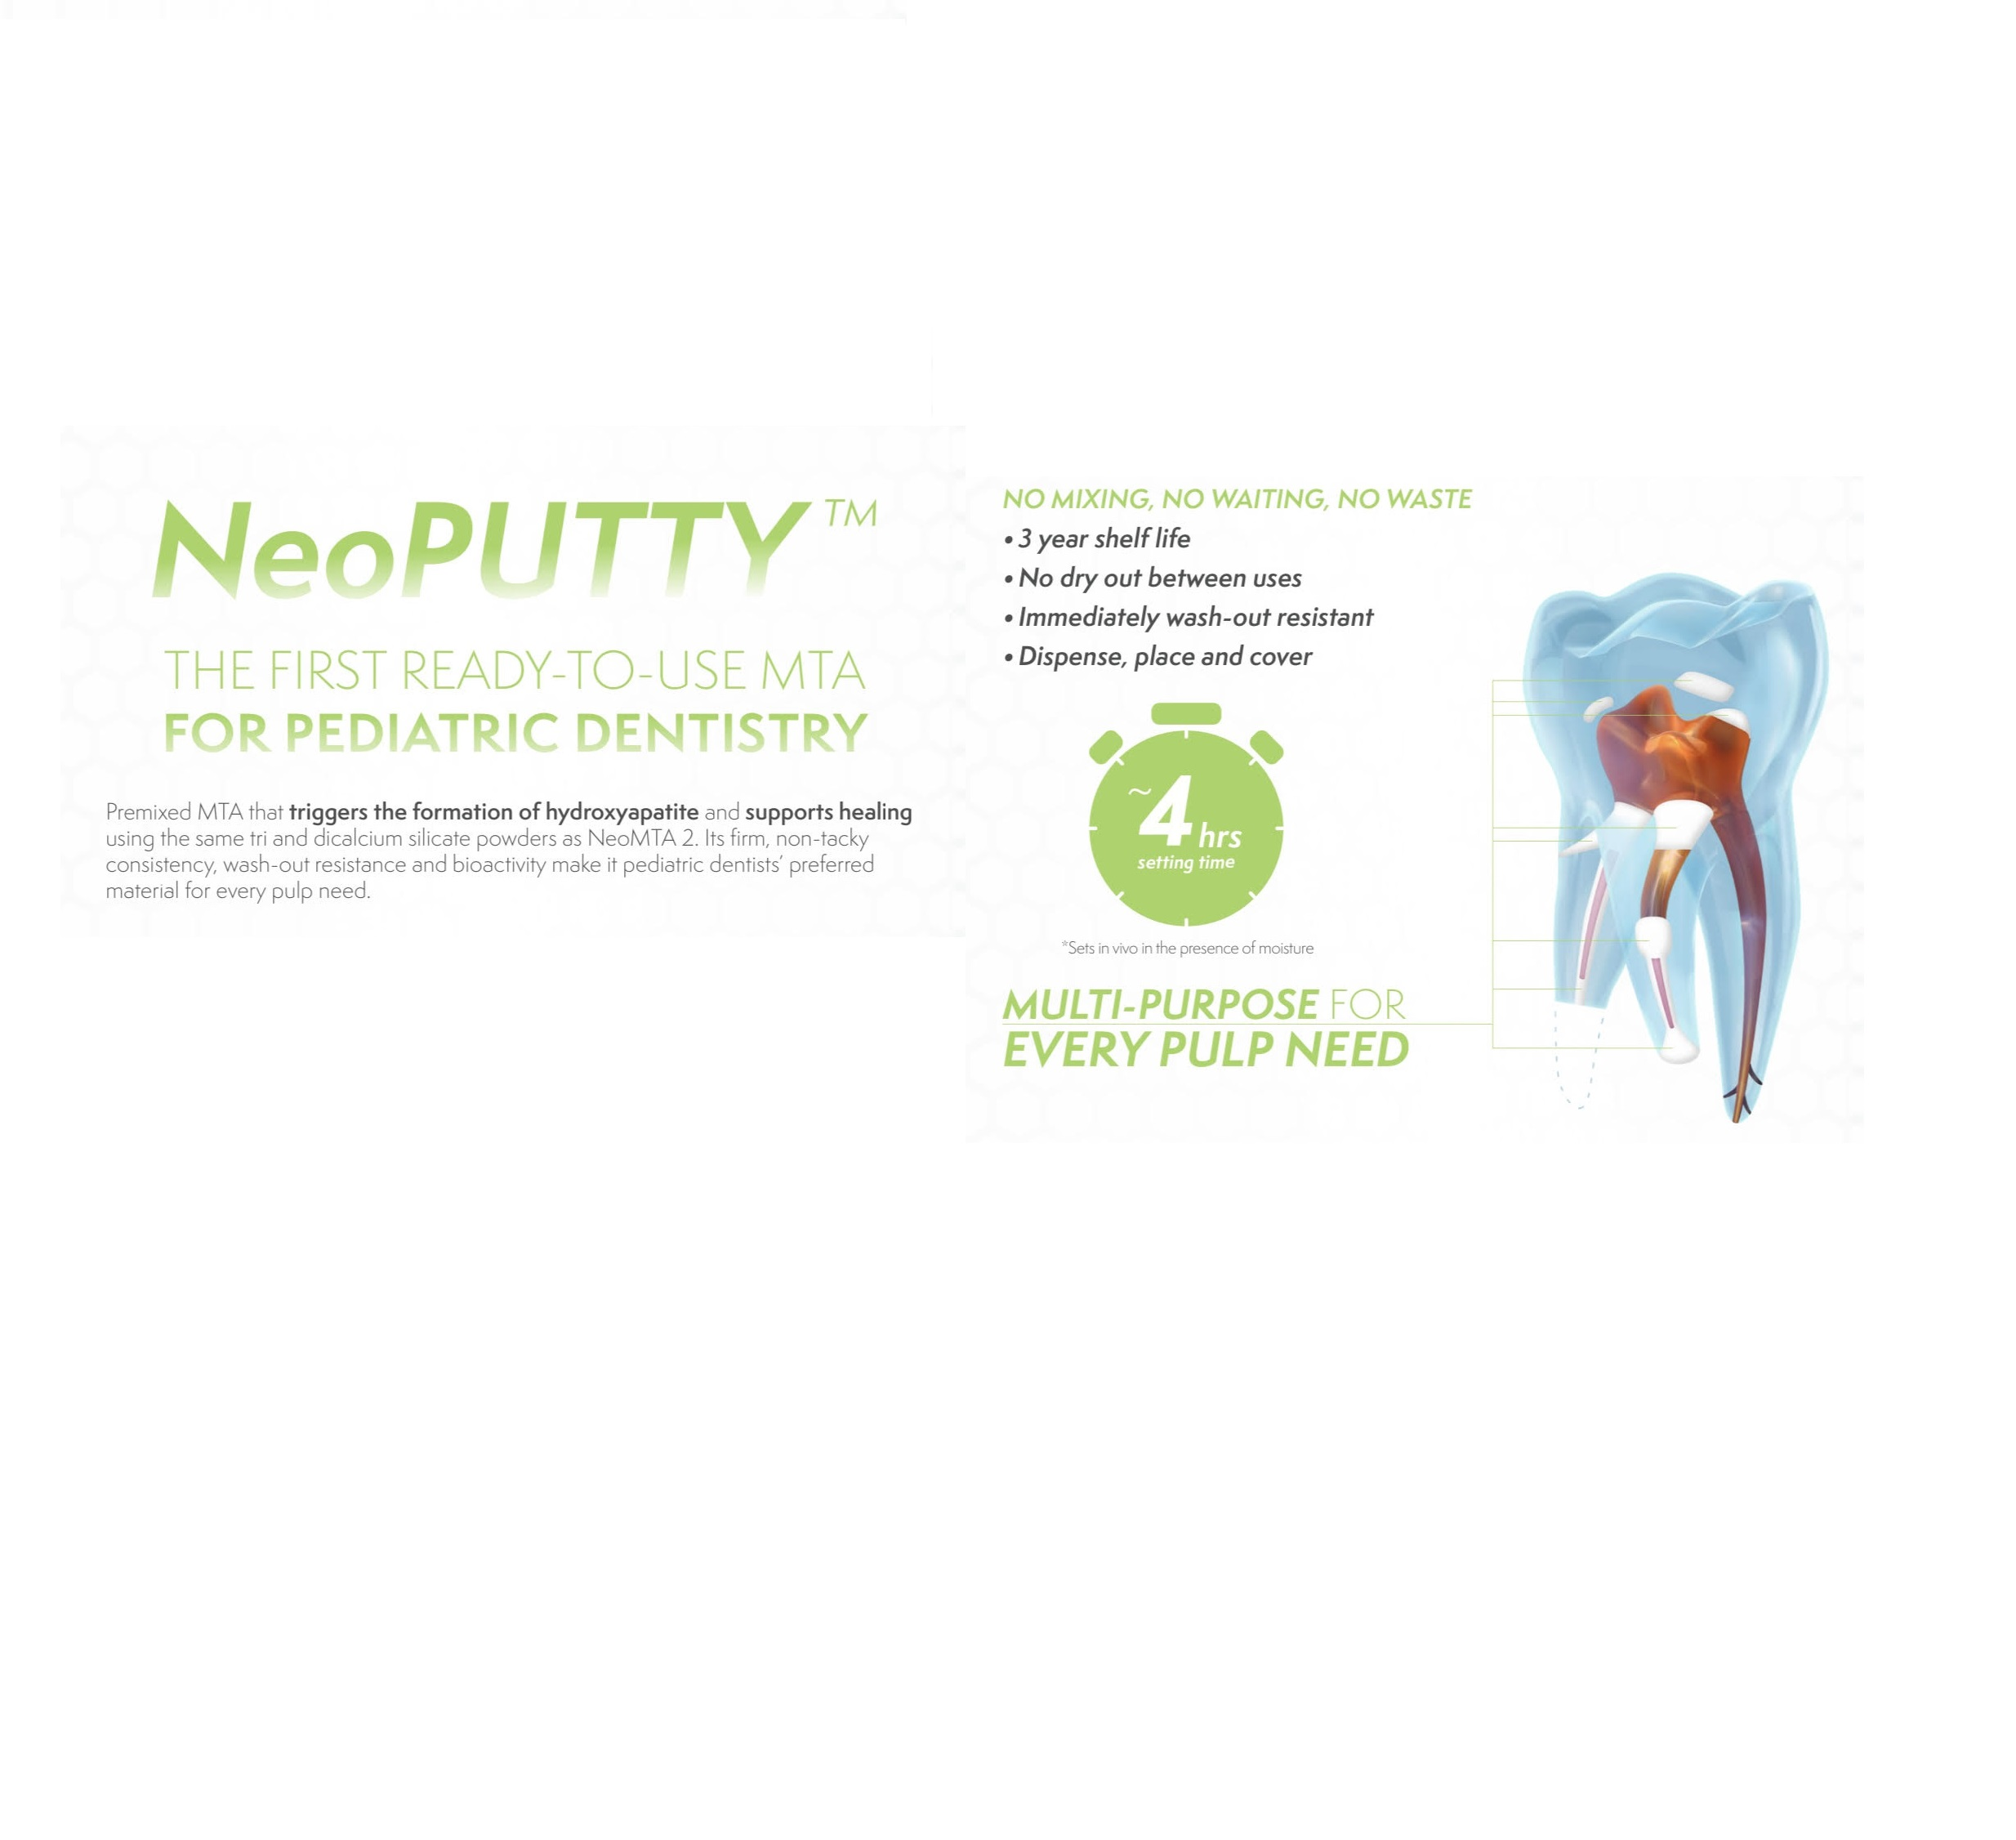 NeoPutty NuSmile